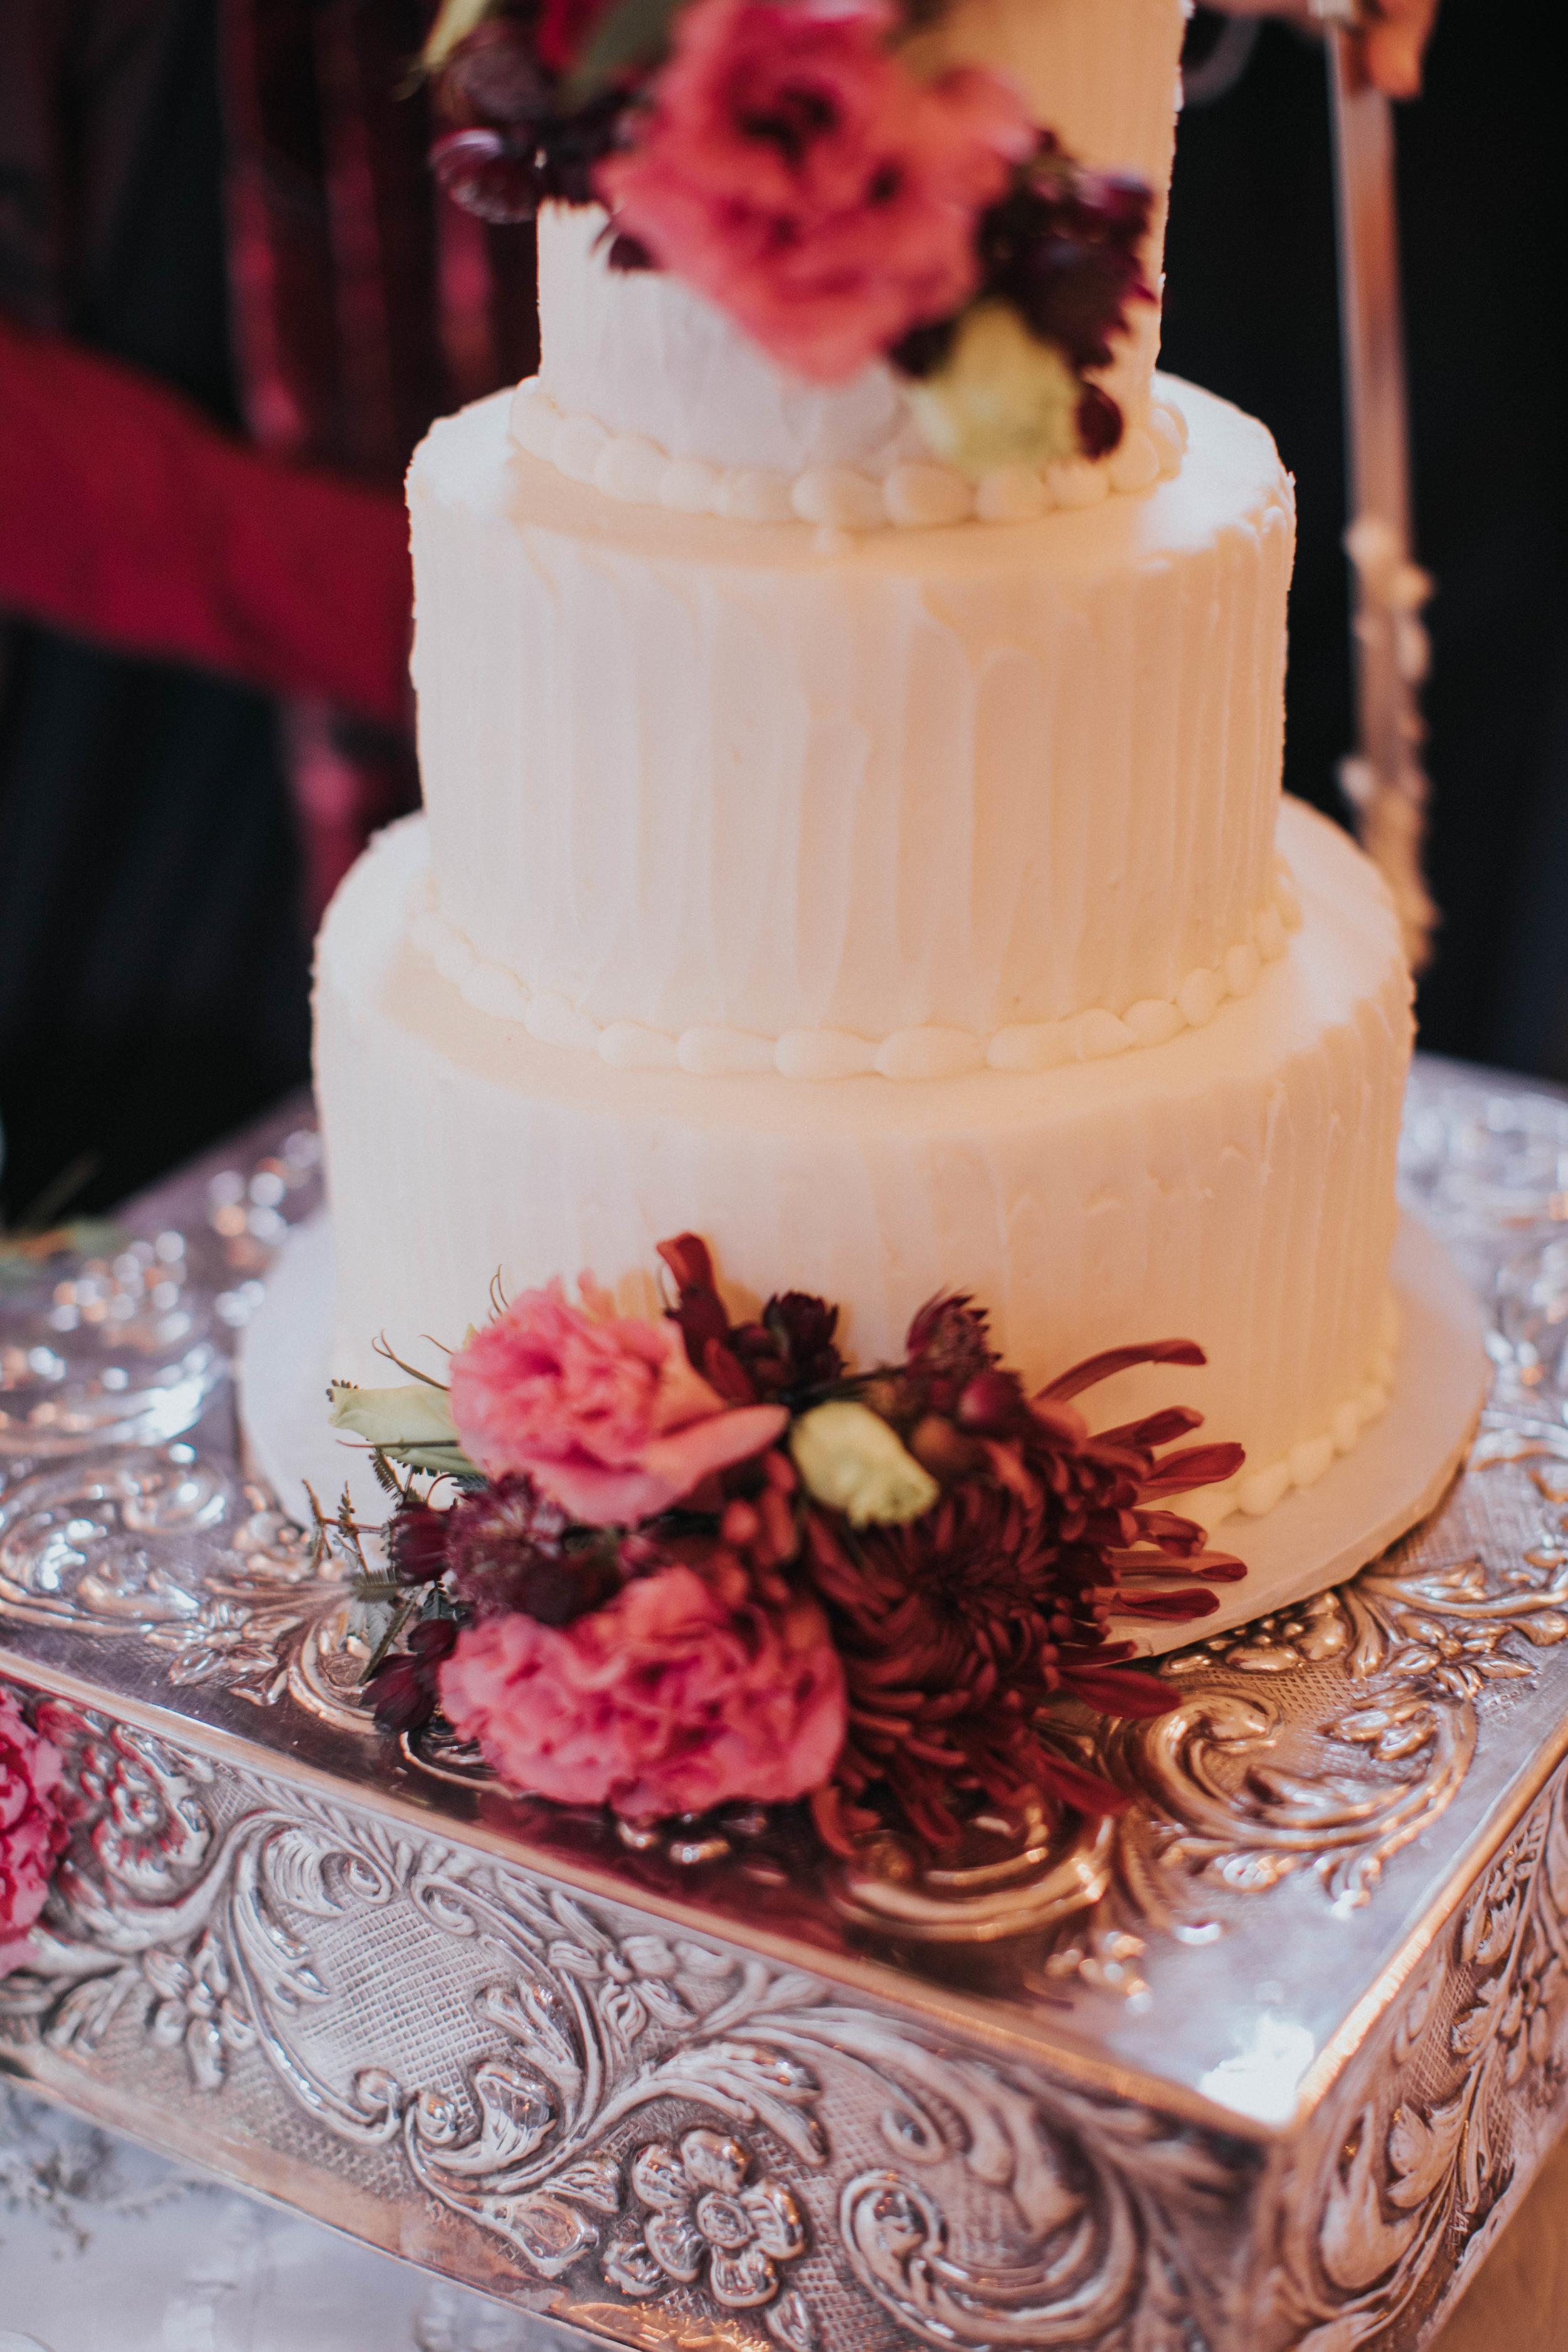 Charis_Lauren_Romantic_Wedding_Photographer_Nashville_03A1585.jpg